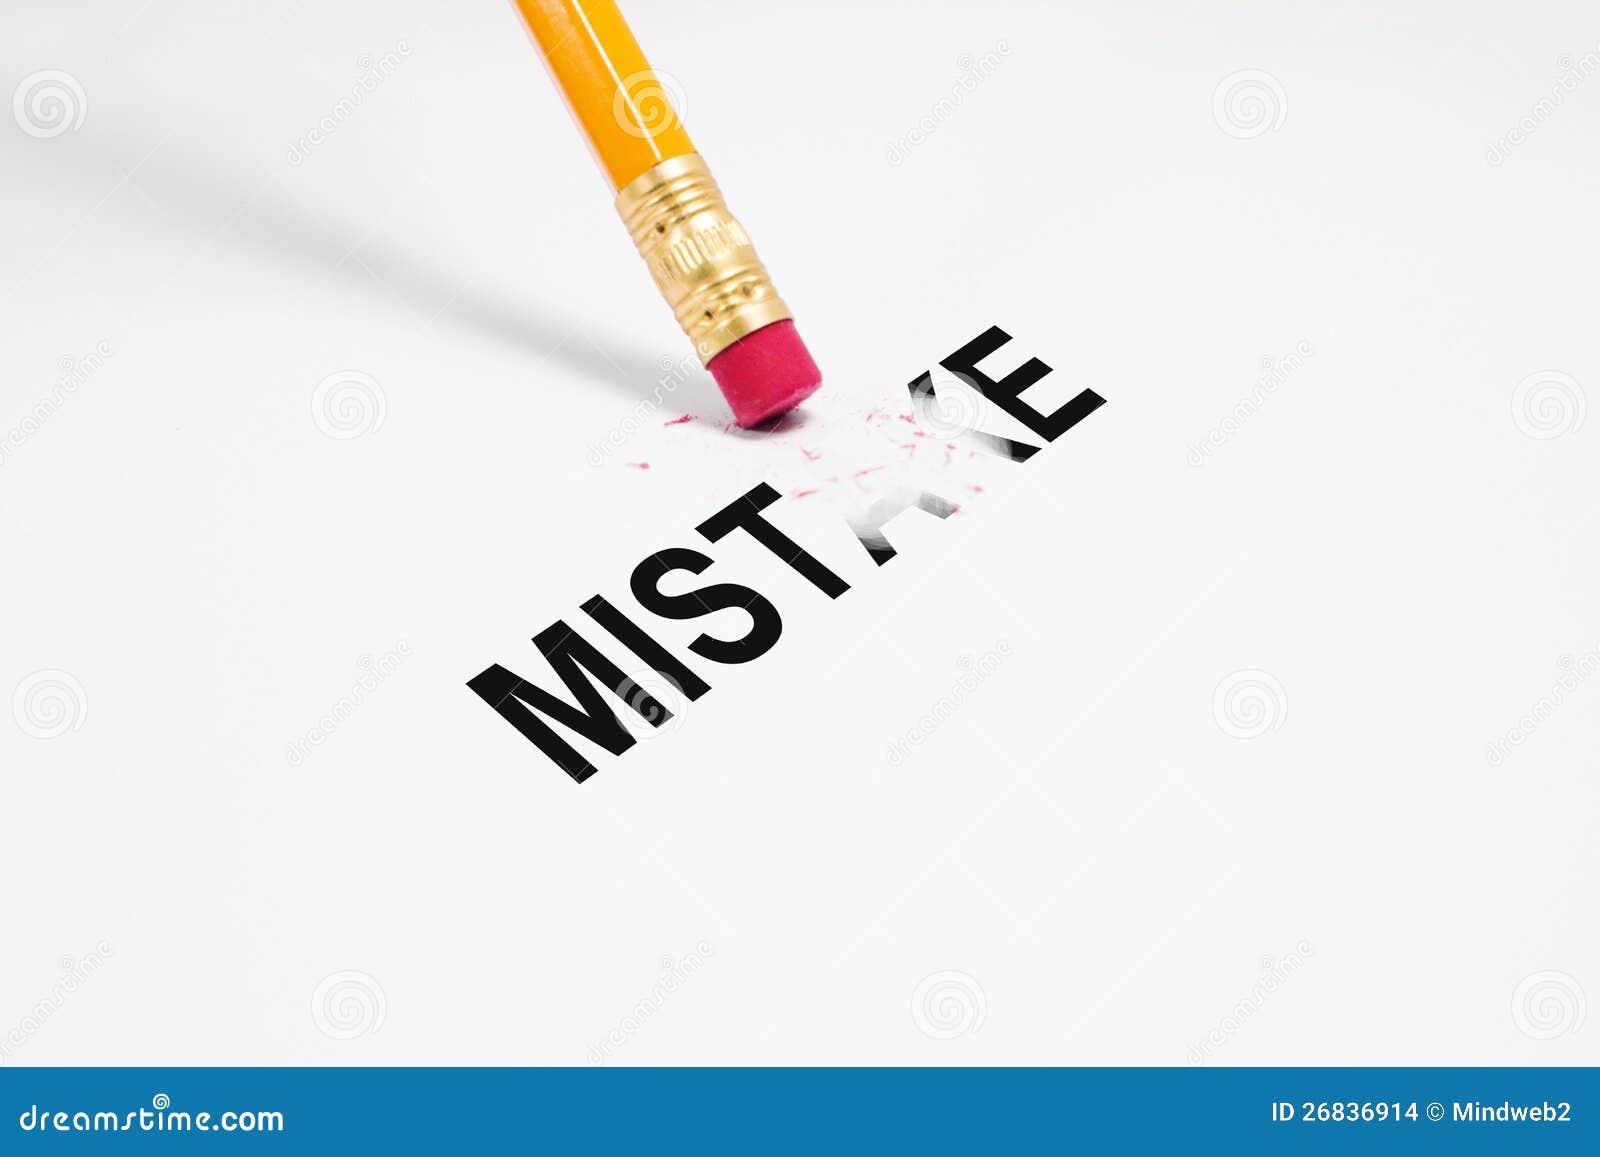 Misstake